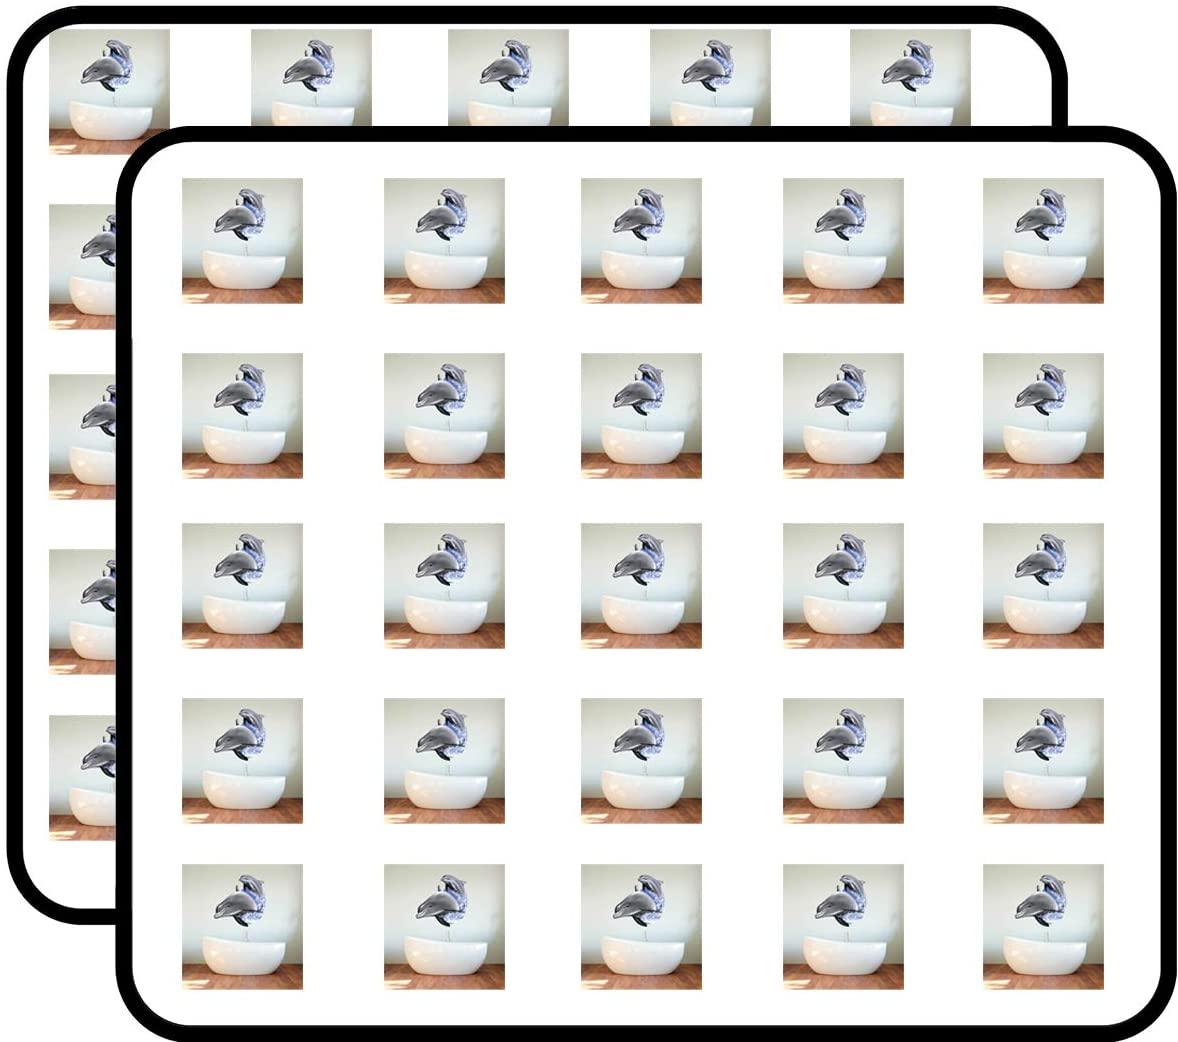 Beautiful Dolphins Ocean Theme Sticker for Scrapbooking, Calendars, Arts, Kids DIY Crafts, Album, Bullet Journals 50 Pack